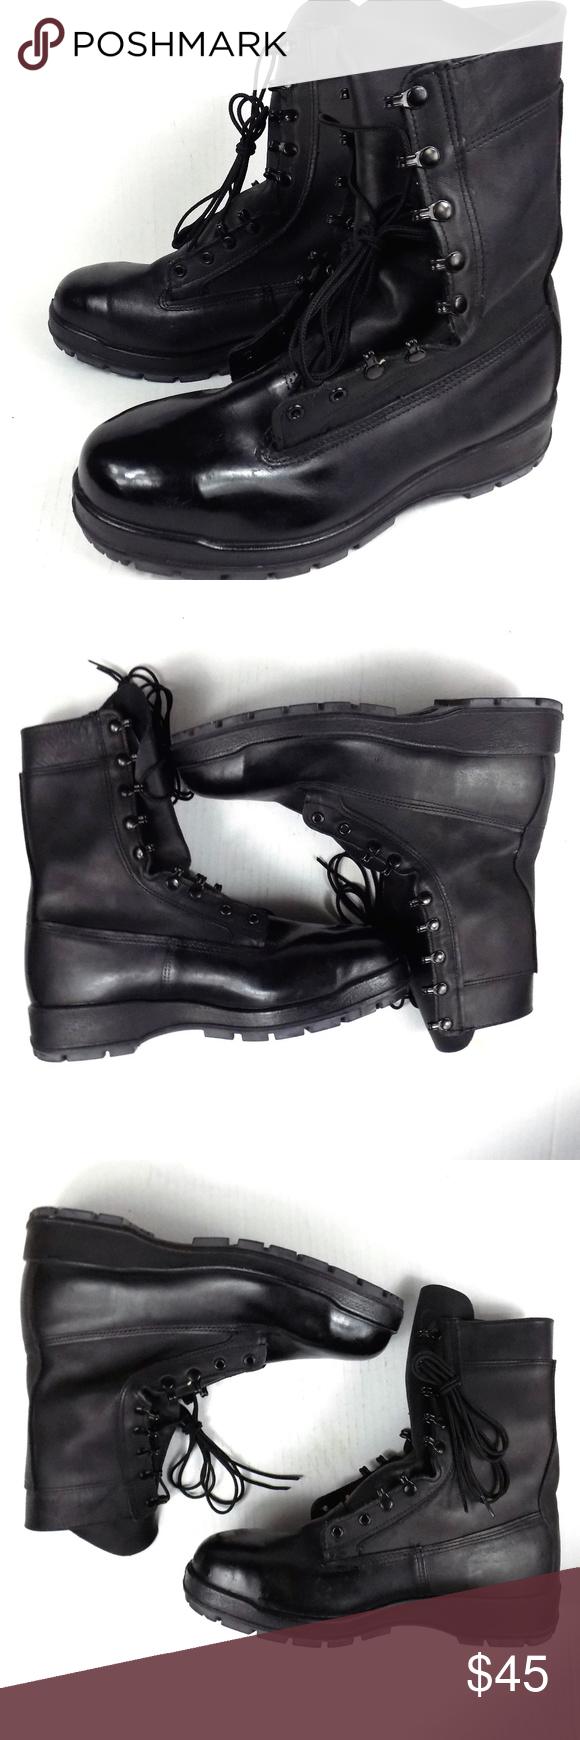 Belleville Steel Toe Boots Military Combat Mens 12